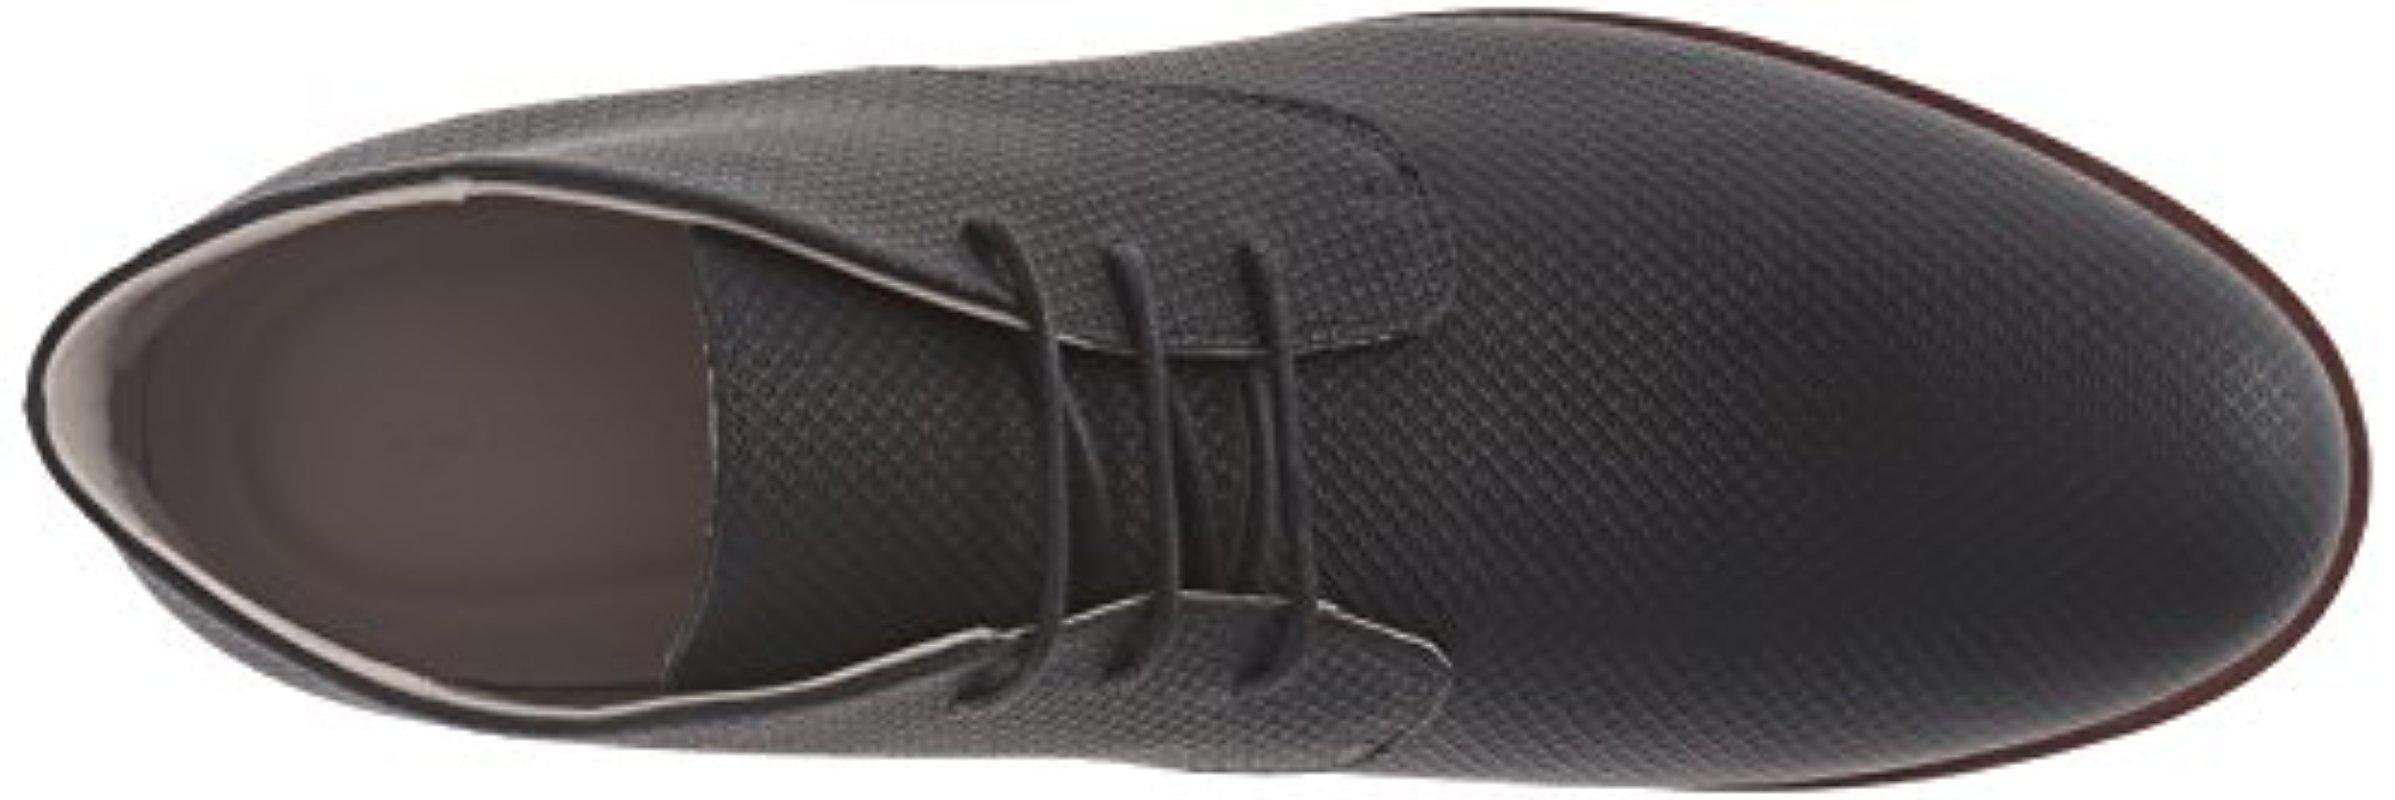 fd2db3ac04898c Lyst - Lacoste Crosley Chukka 316 2 Cam Chelsea Boot in Black for Men